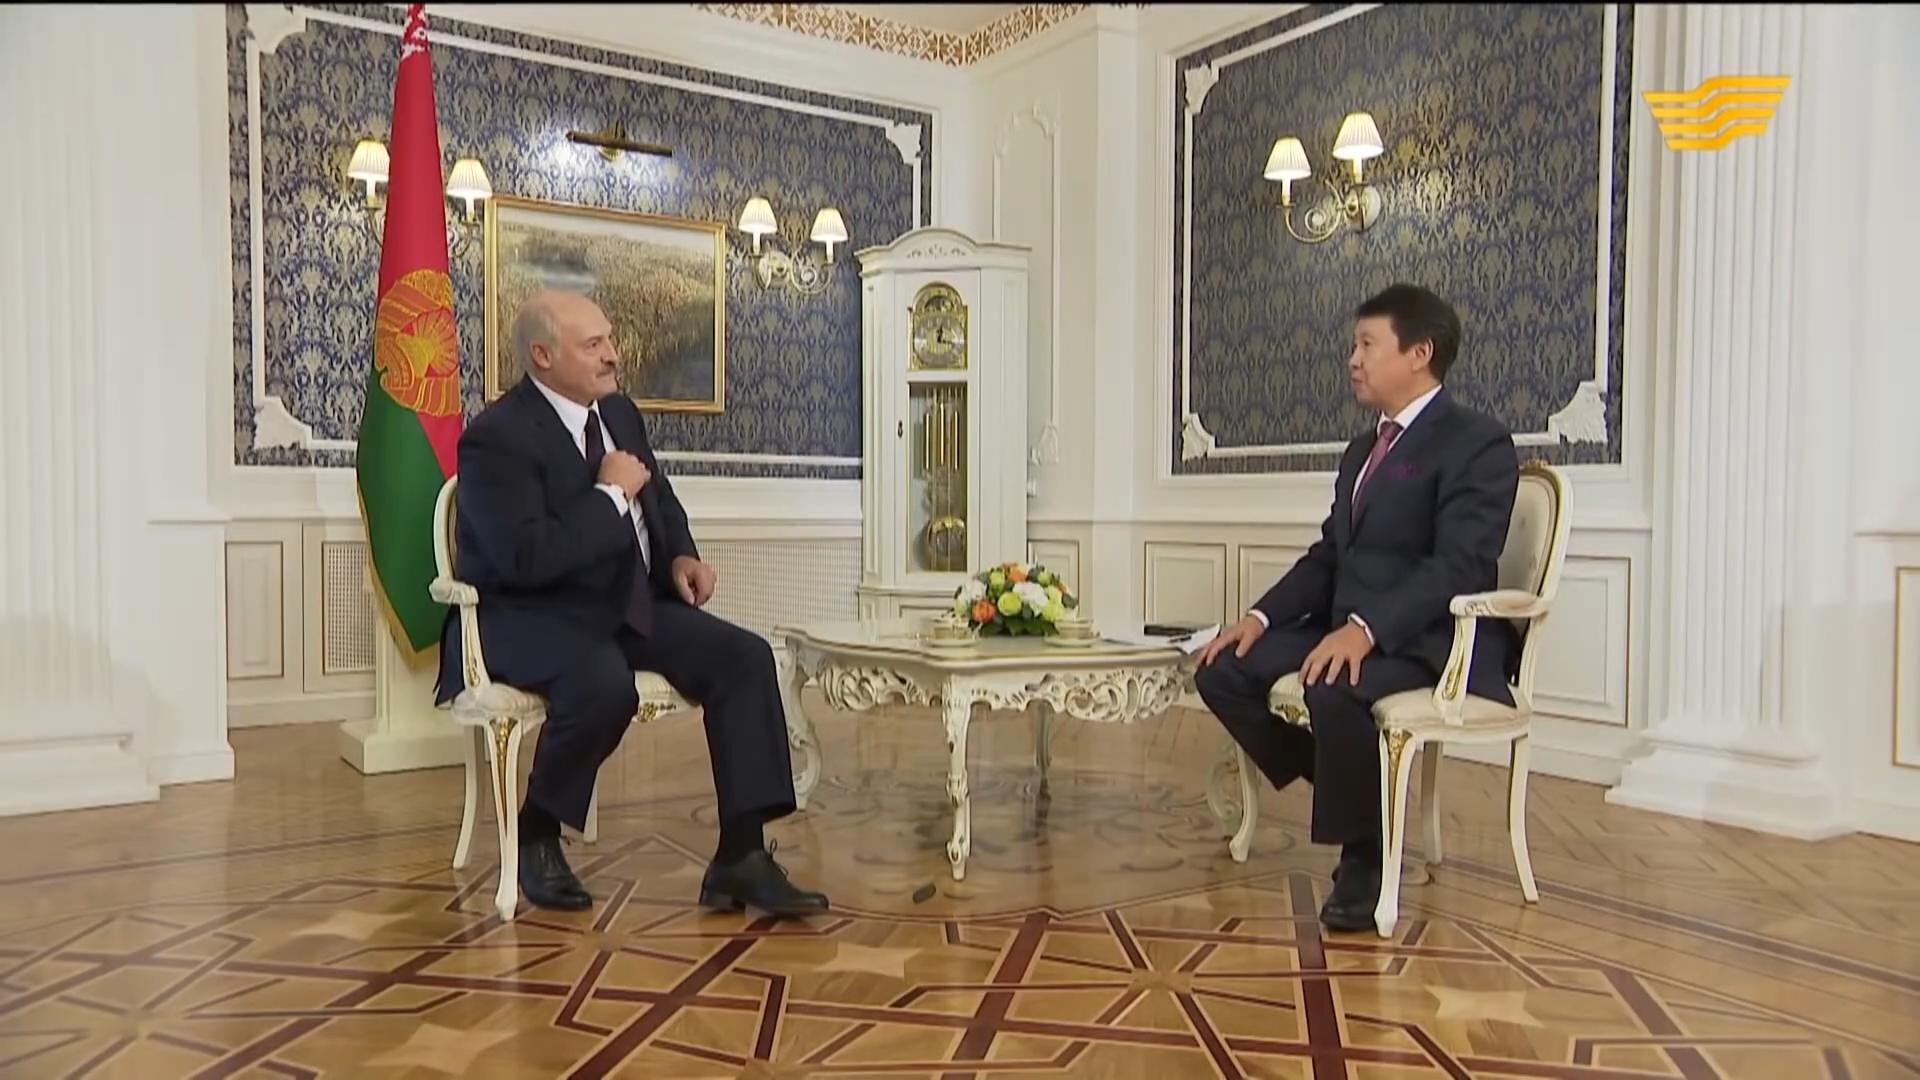 20191022_20-40-Александр Лукашенко дал эксклюзивное интервью телеканалу «Хабар»-scr36